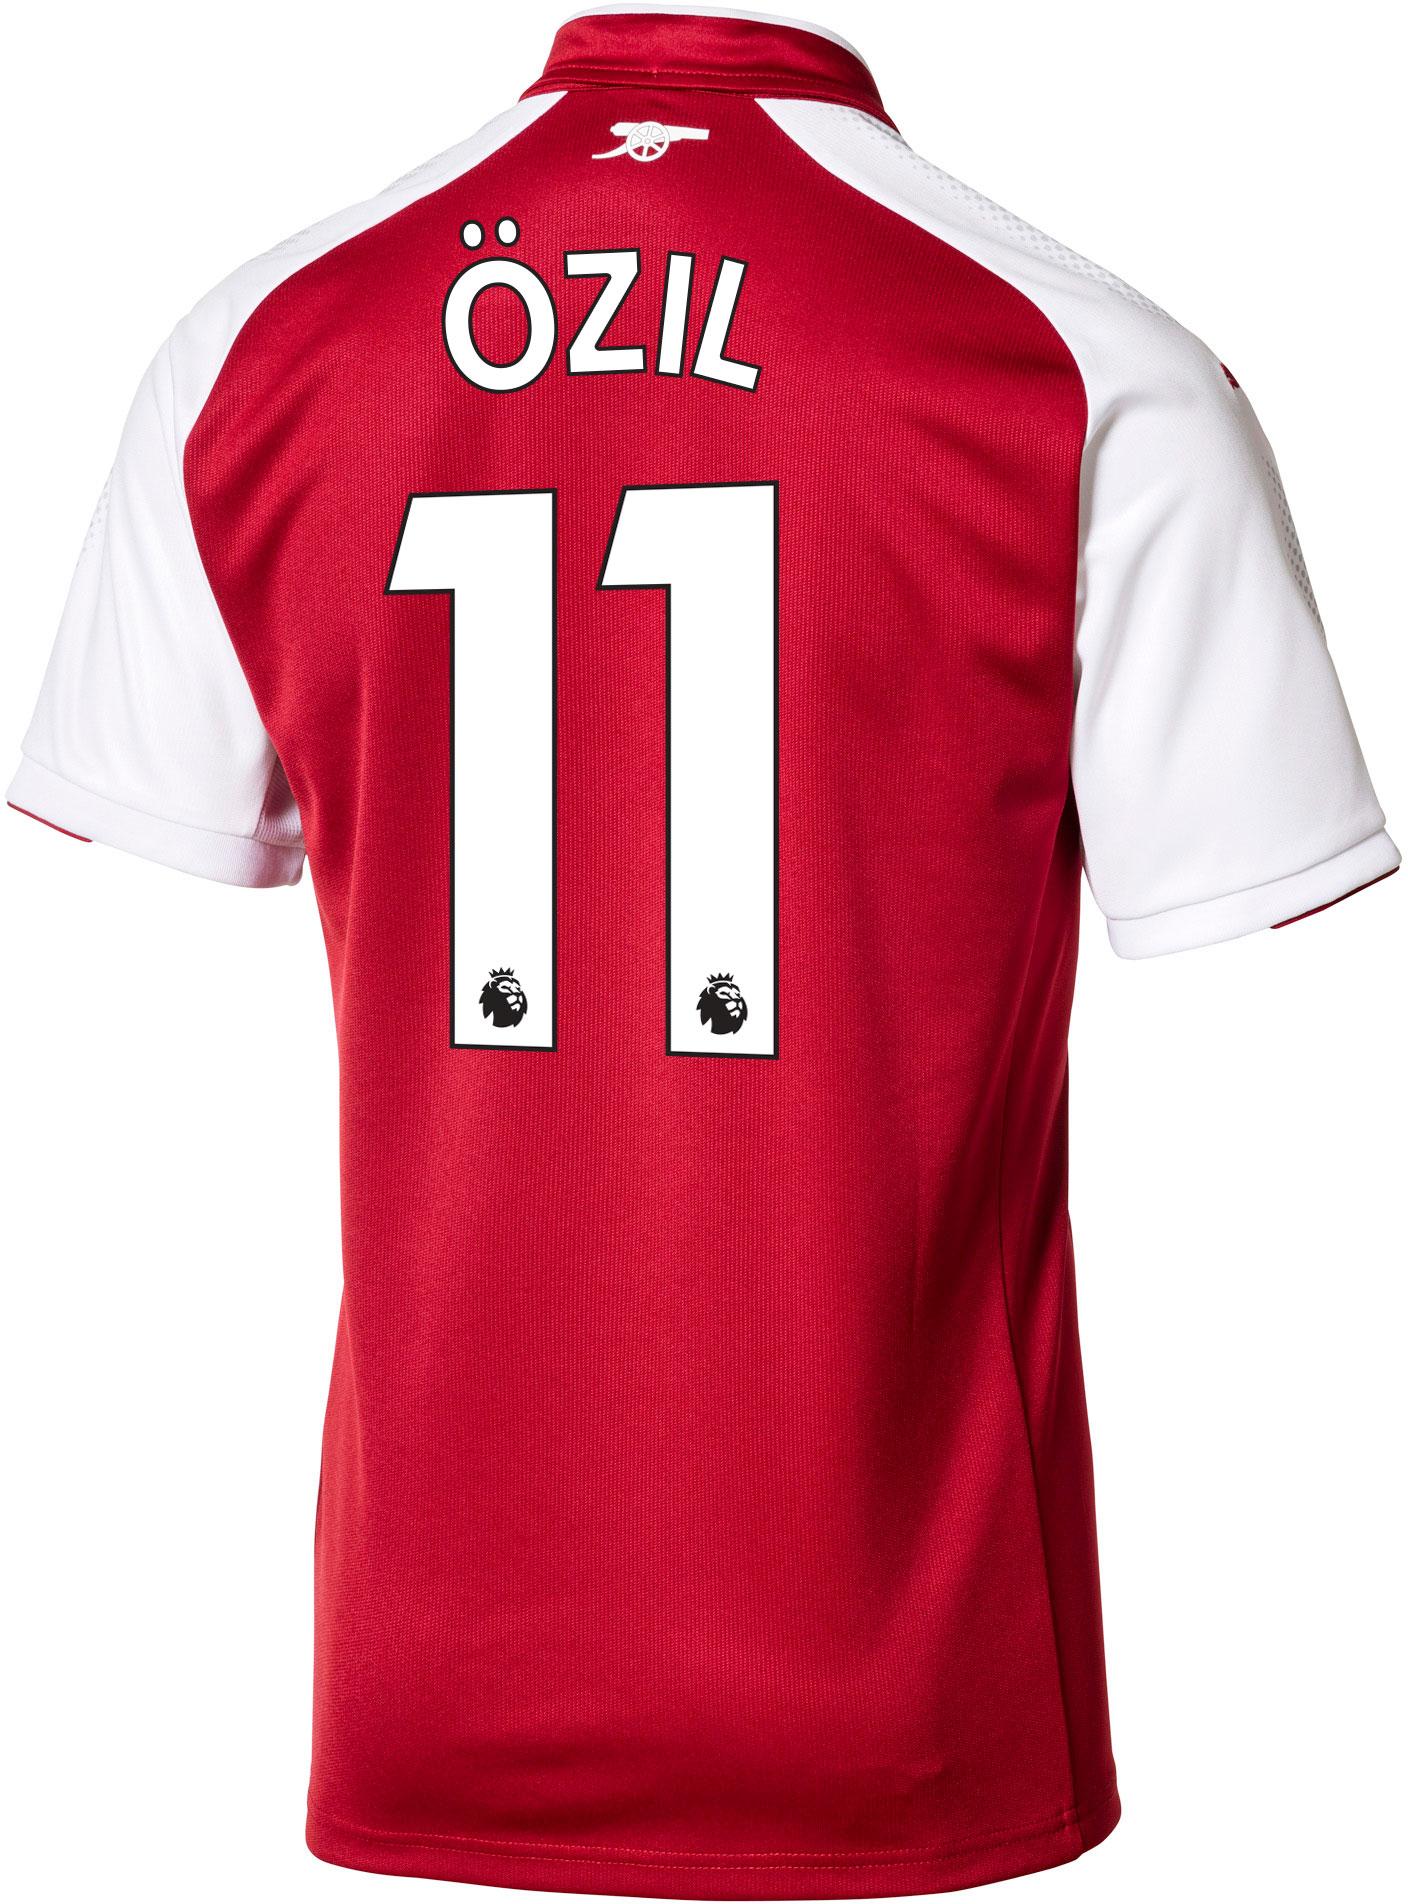 purchase cheap c34c7 4cc2f Puma Kids Mesut Ozil Arsenal Home Jersey 2017-18